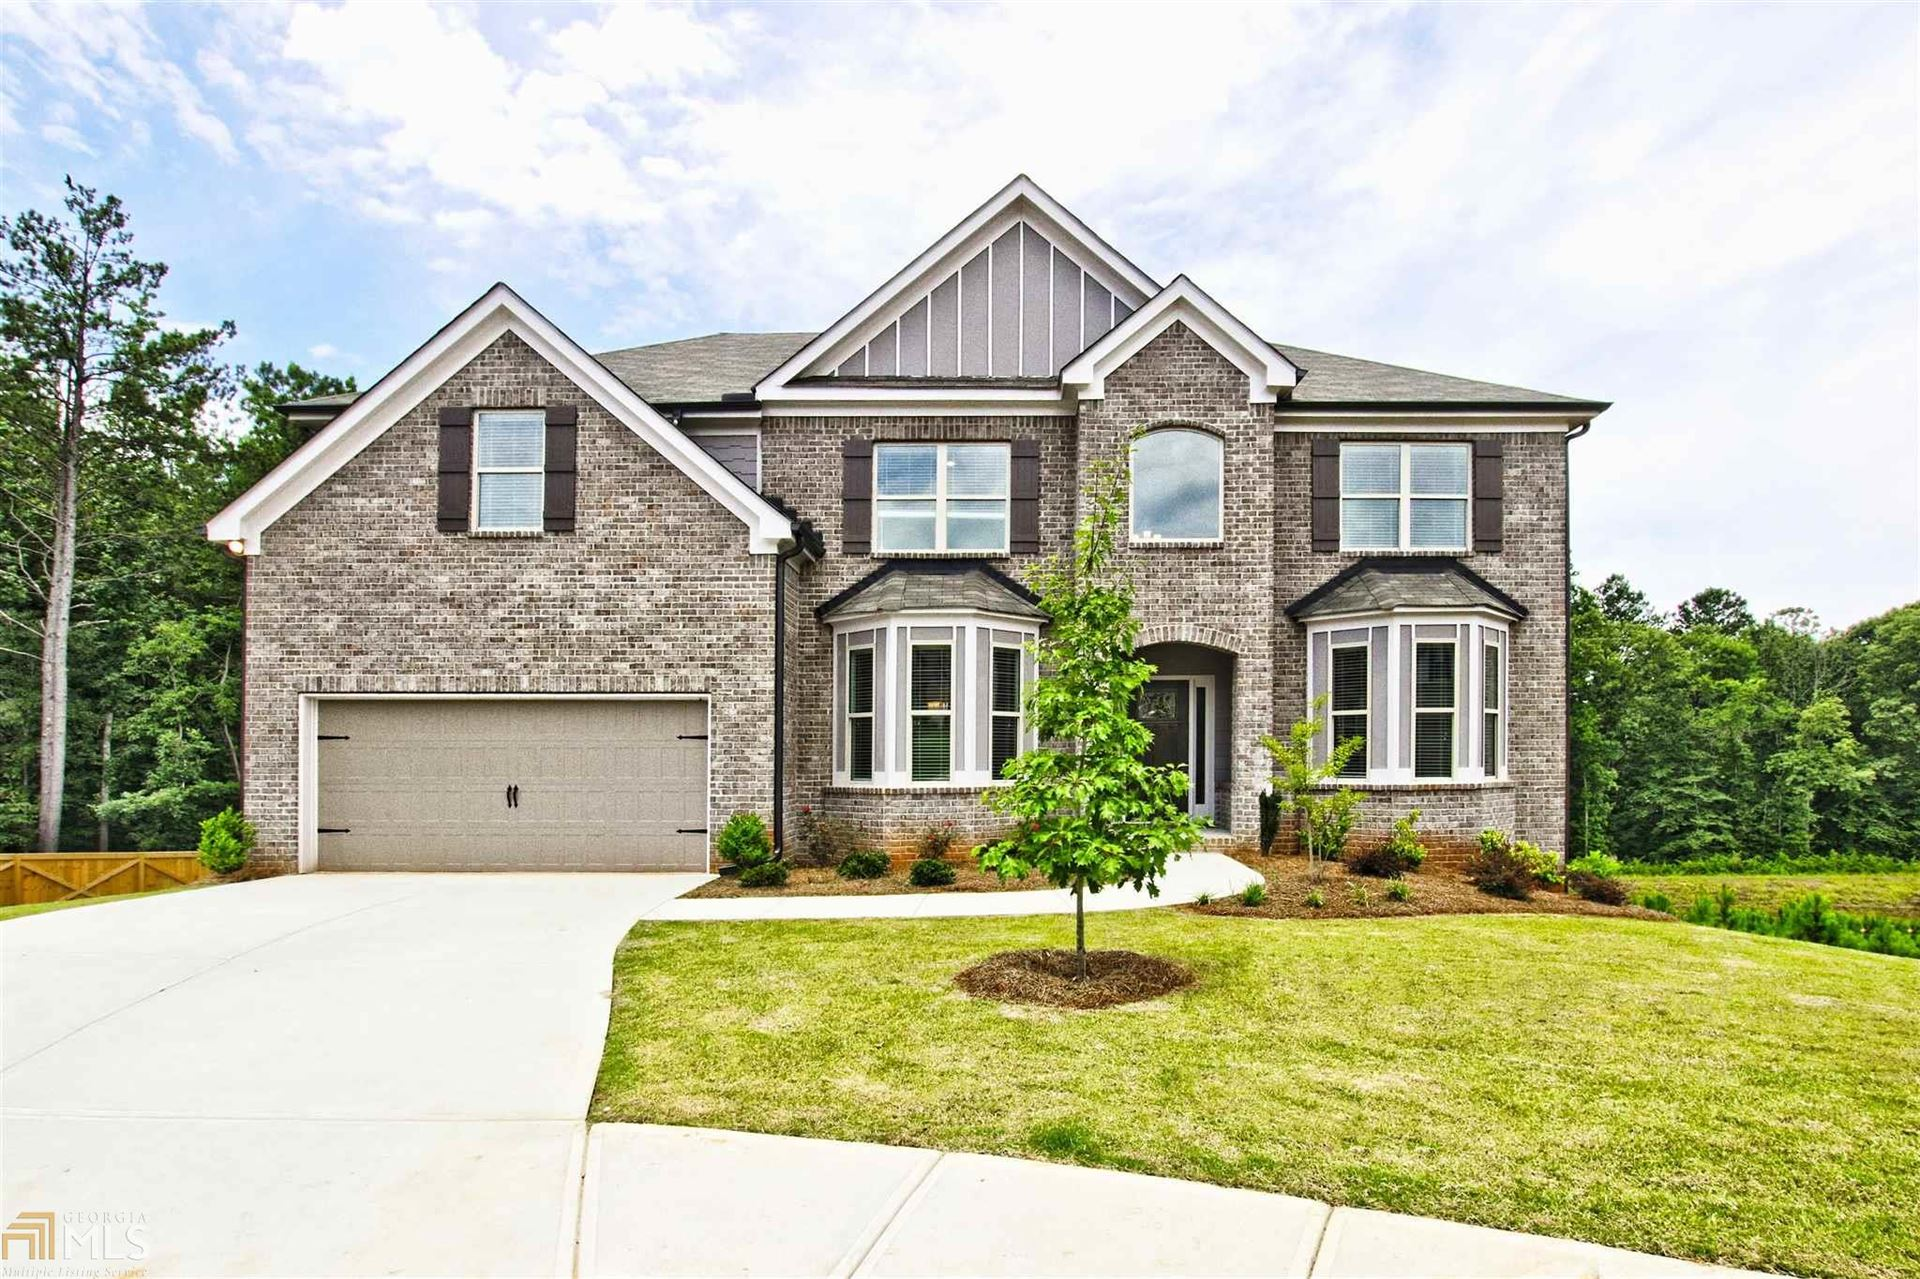 3728 In Bloom Way, Auburn, GA 30011 - #: 8756908